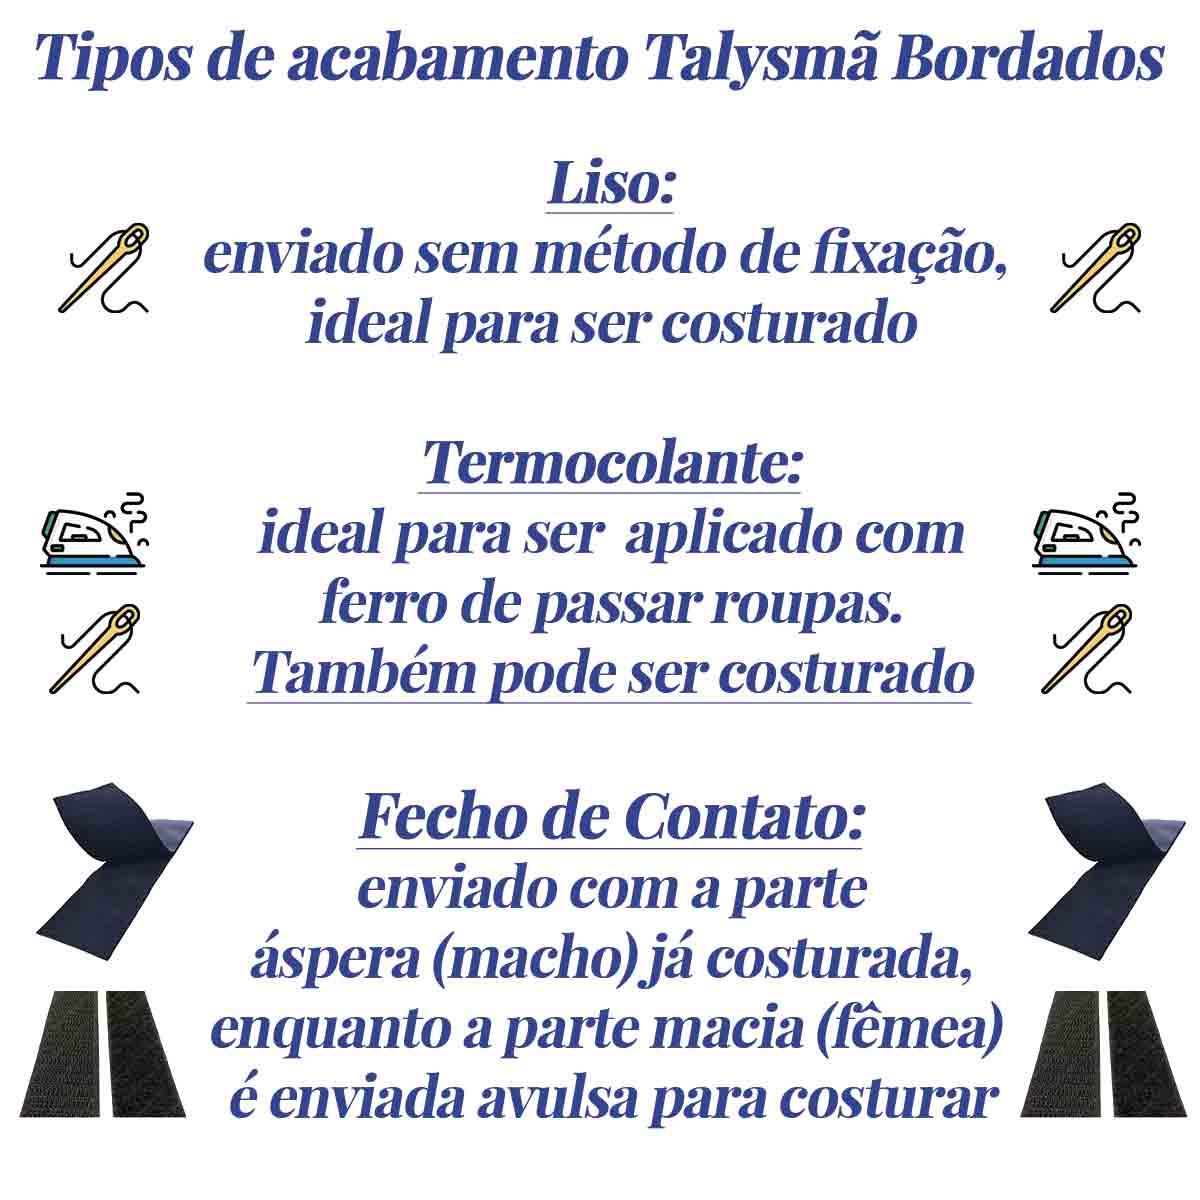 Patch Bordado - Alfabeto Letra R DV80531-419  - Talysmã Bordados